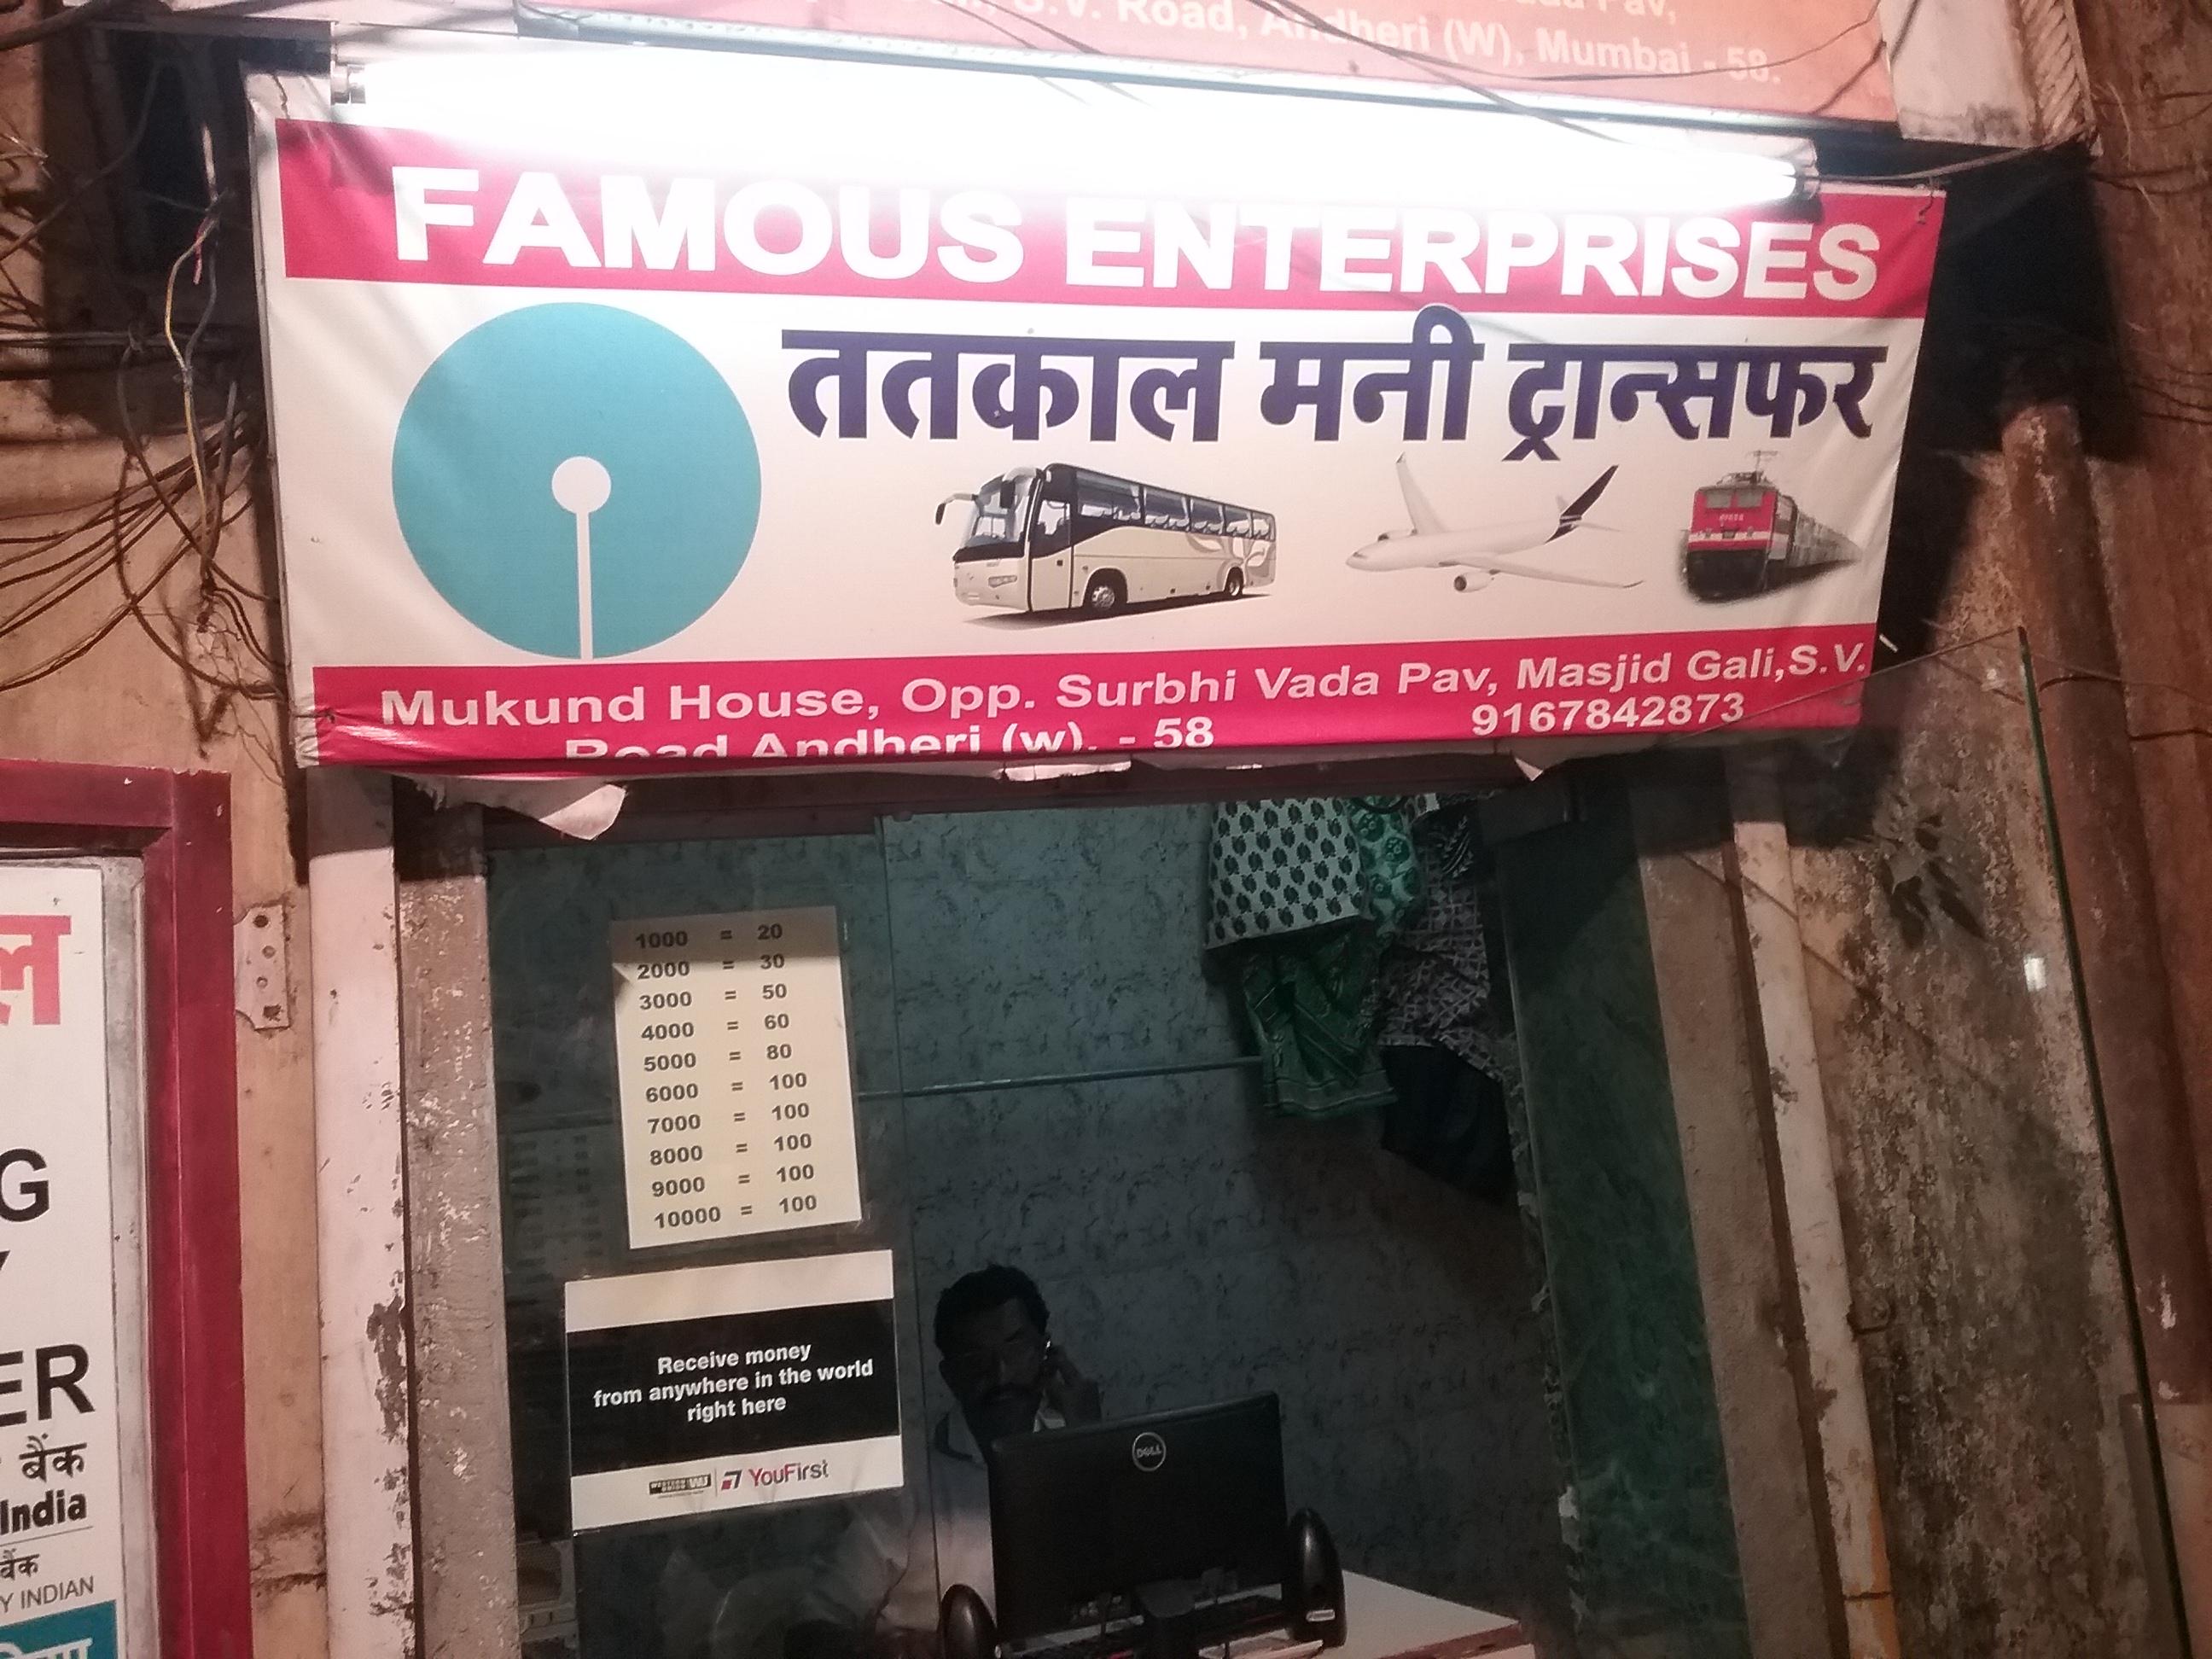 Oxigen Money Transfer Agencies Andheri West Mumbai